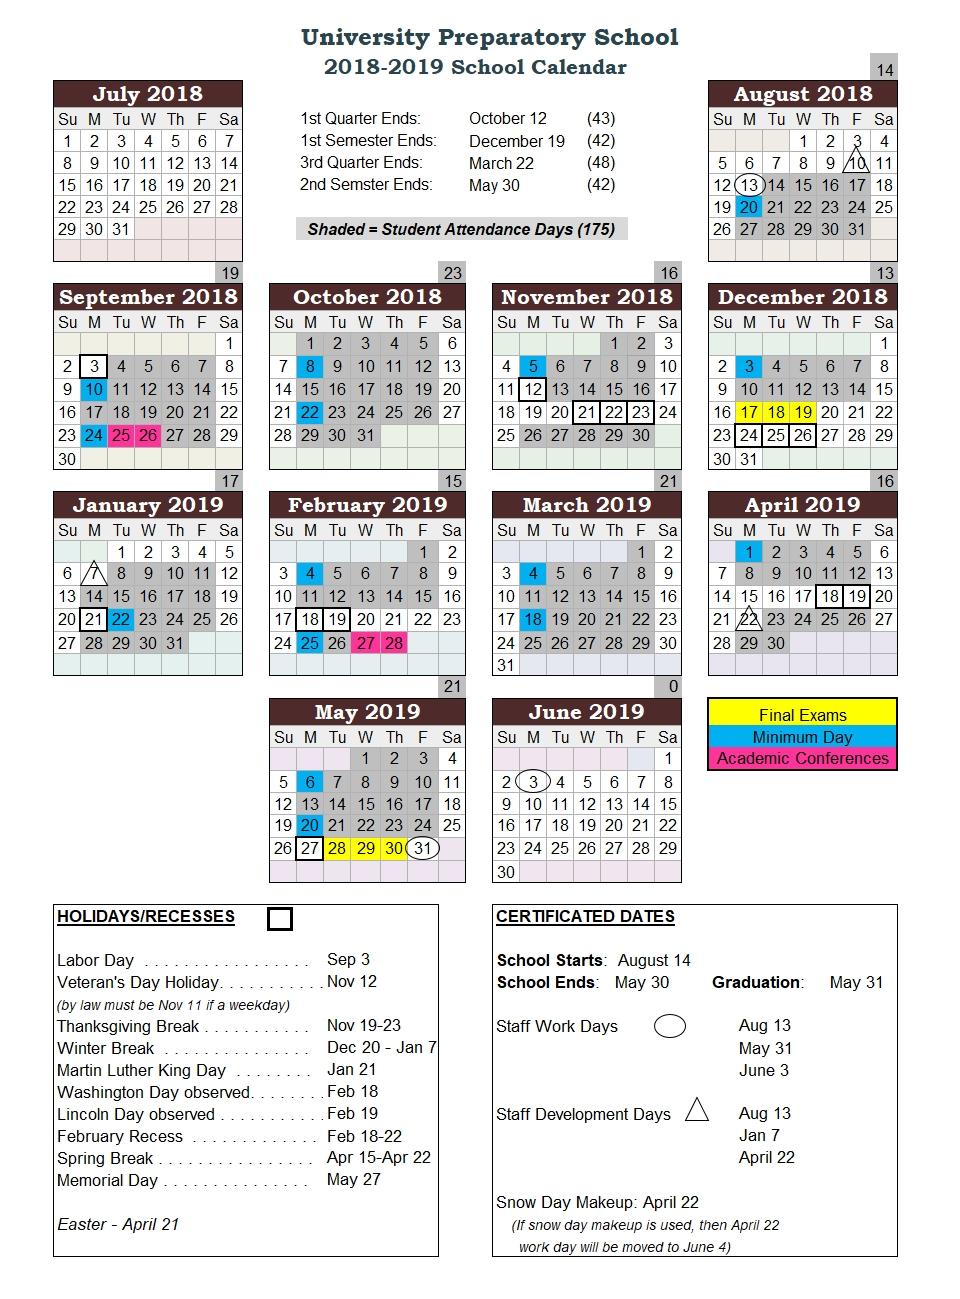 School Calendar U Of W Calendar 2019